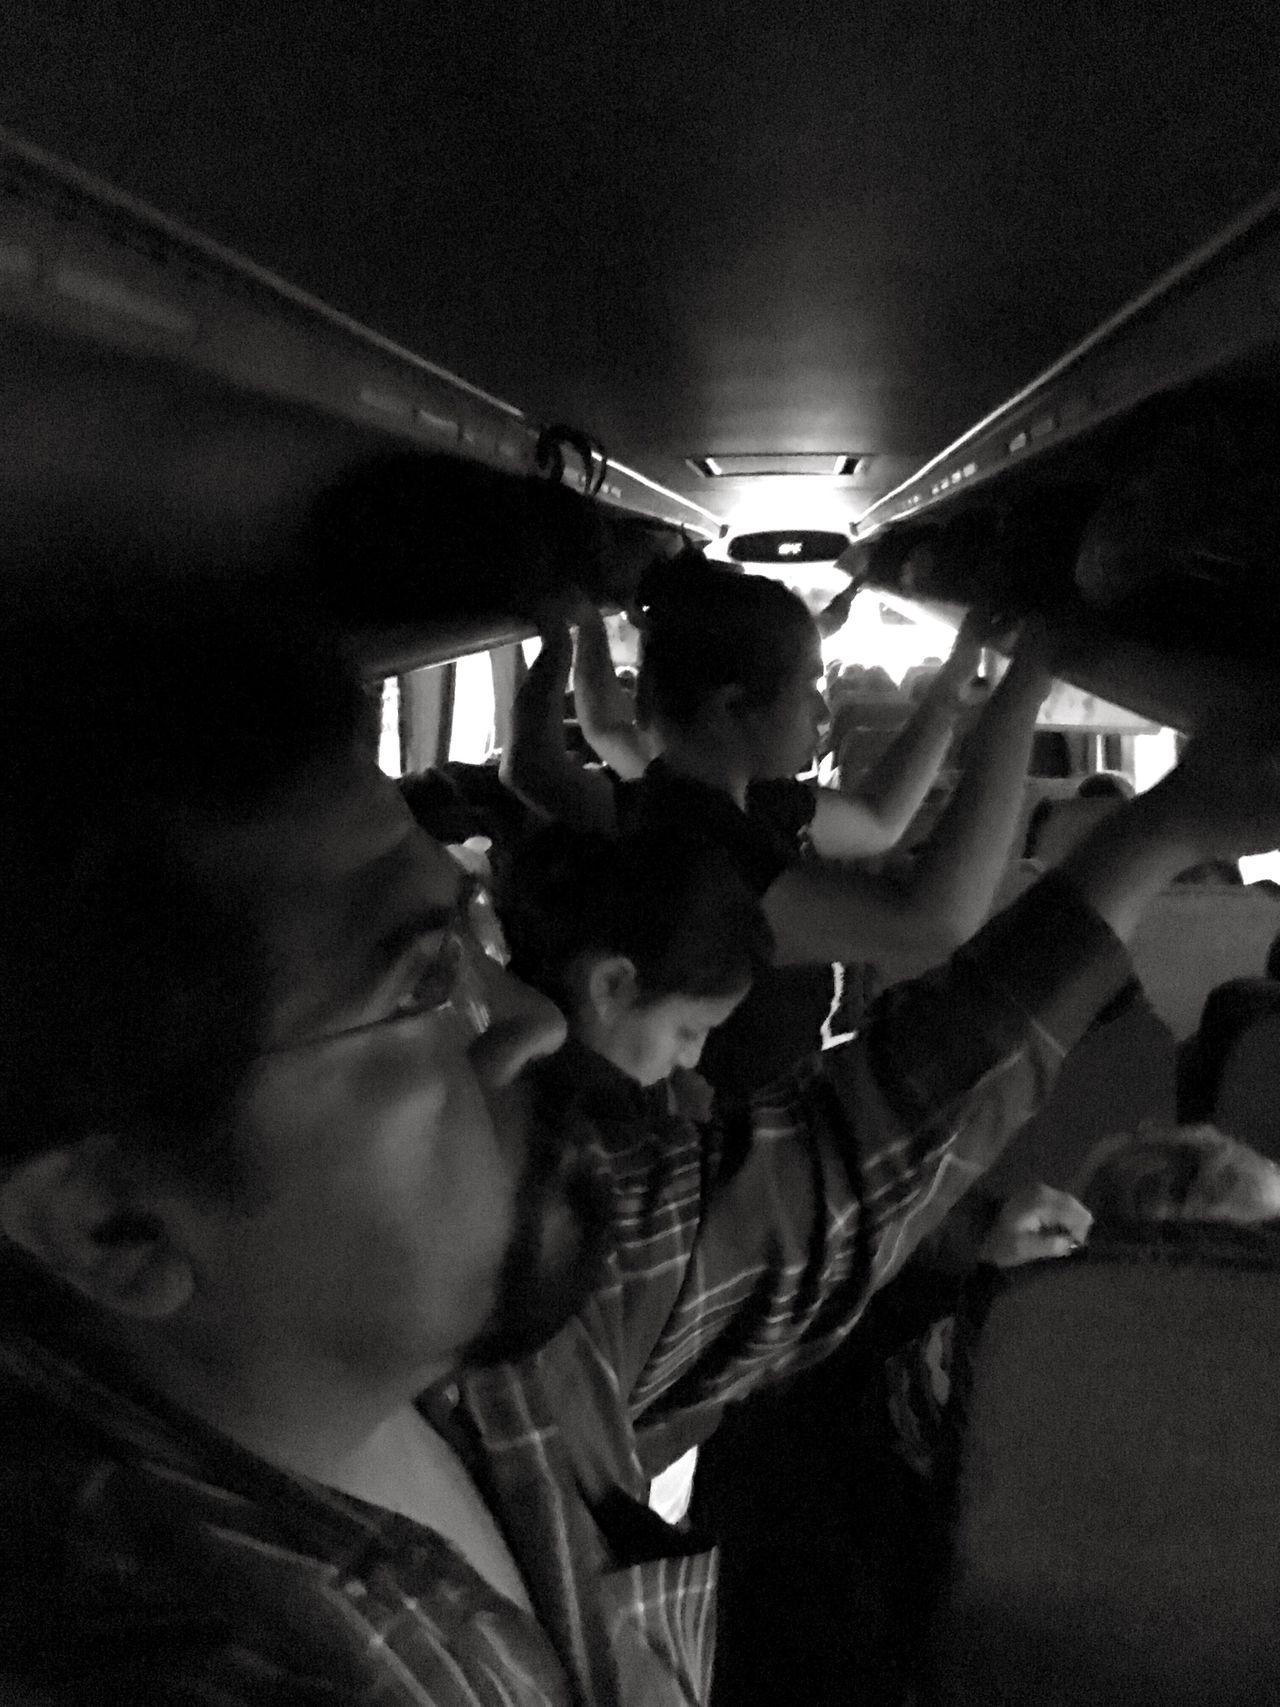 Punto de fuga Real People Transportation Blackandwhite Public Transportation EyeEm Best Shots - Black + White